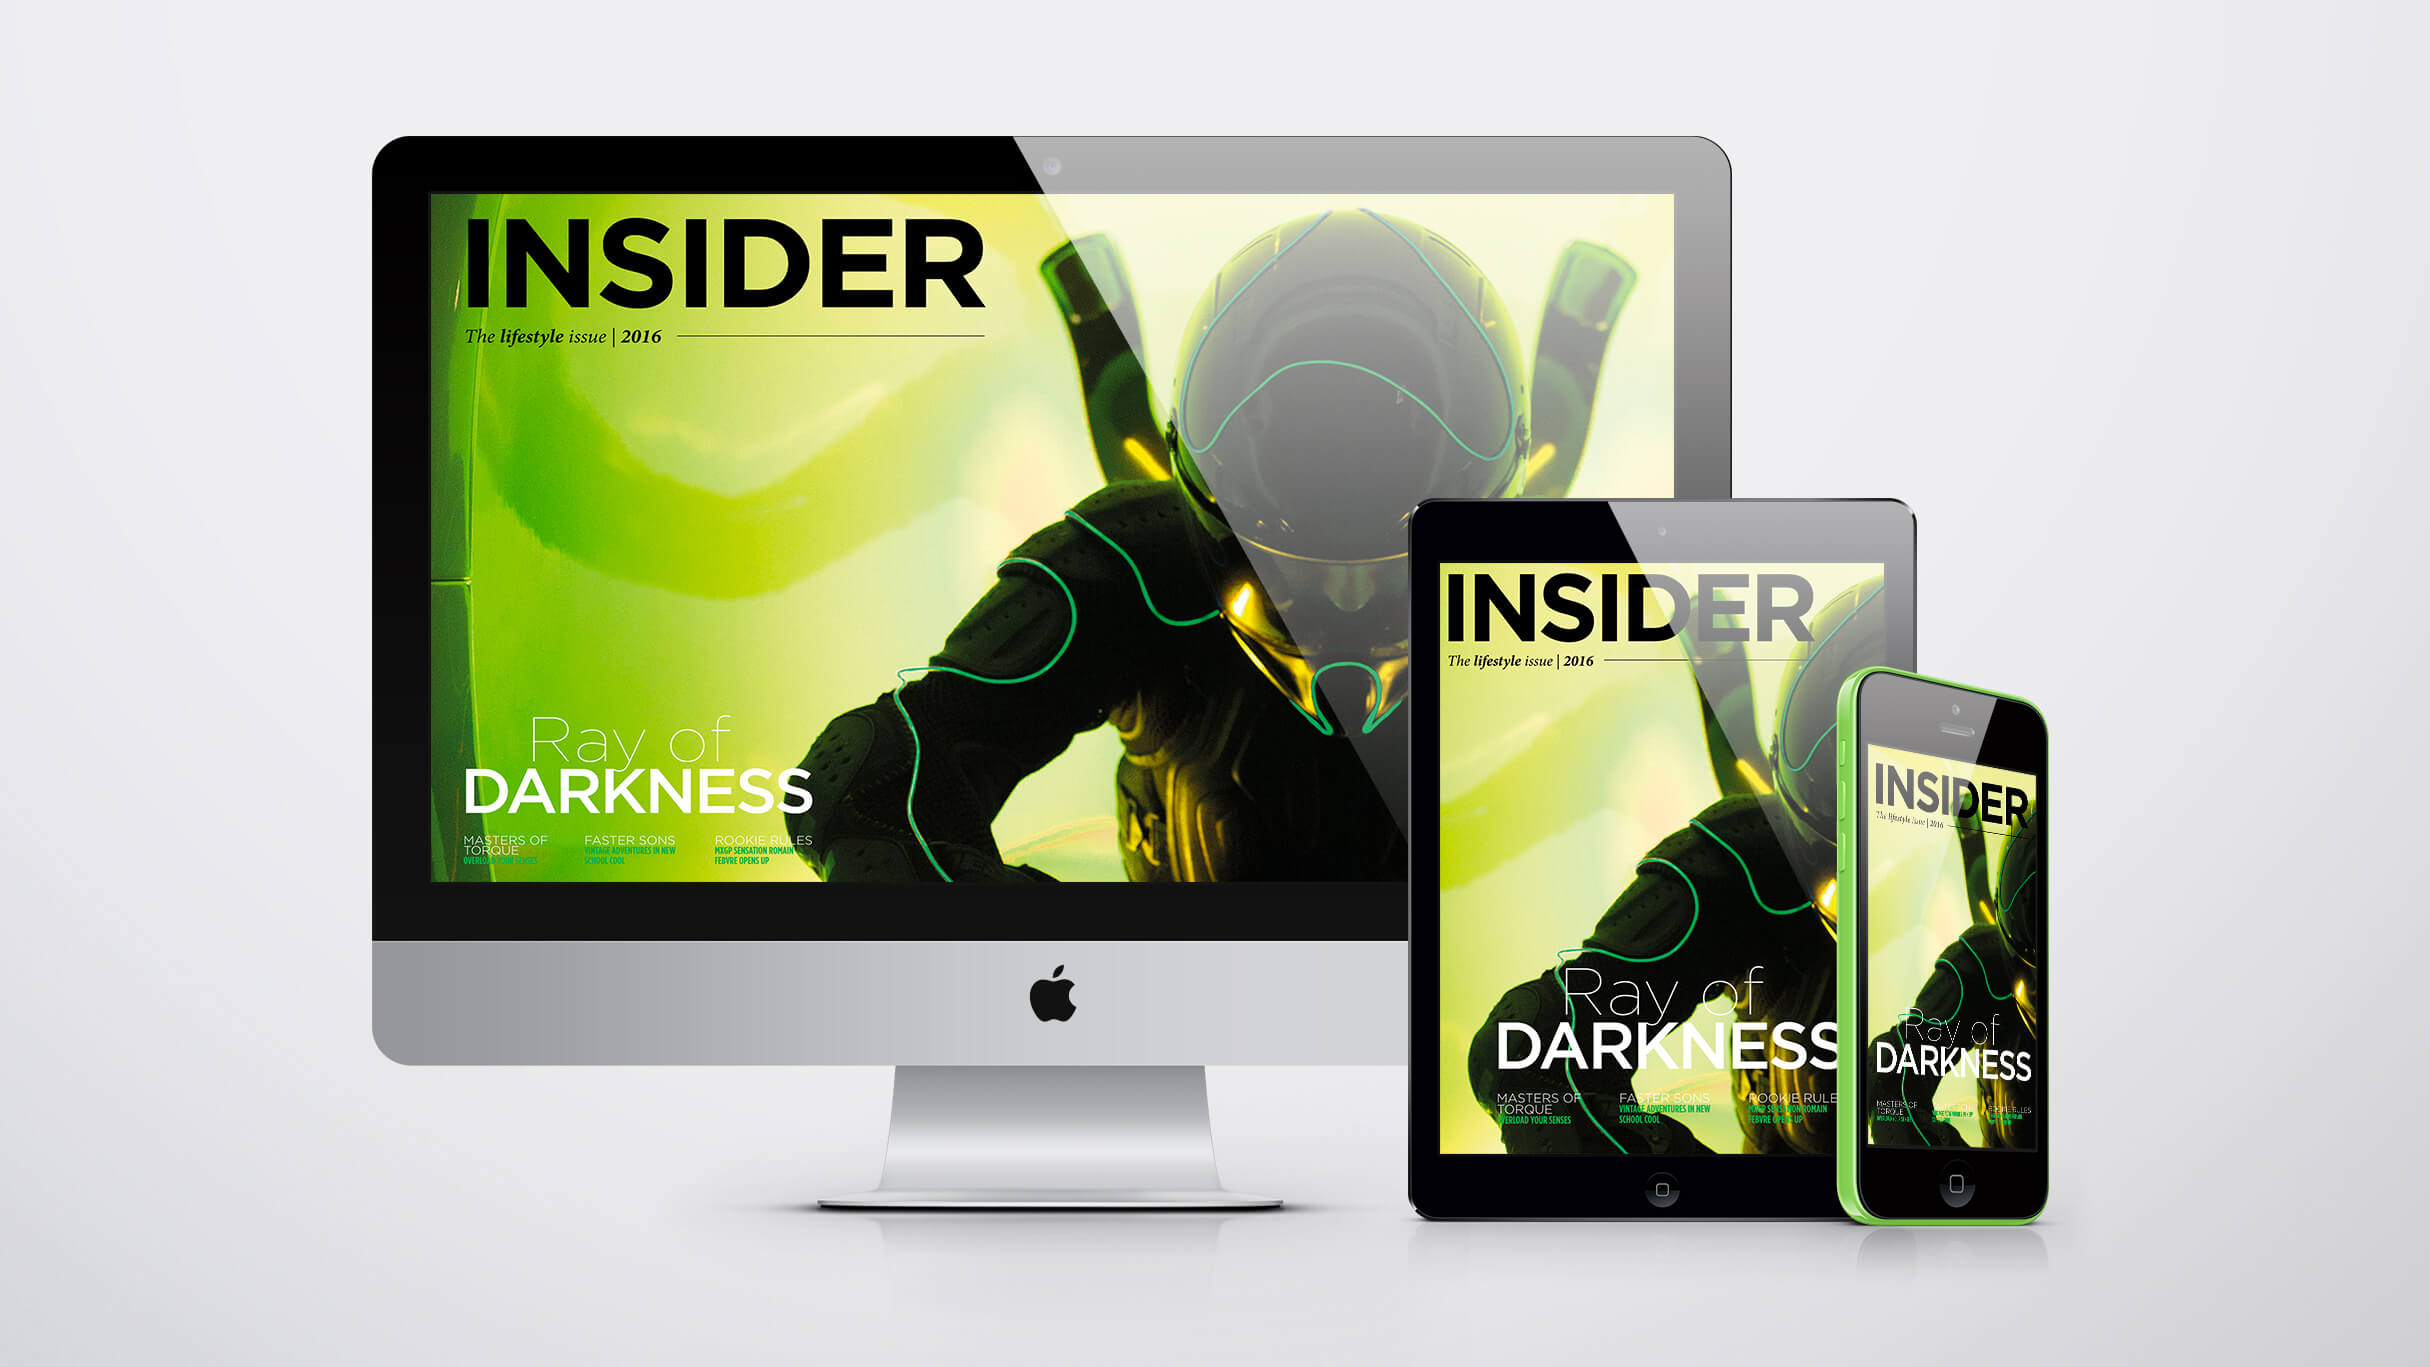 Insider Lifestyle Magazine 2016 Online - Cover